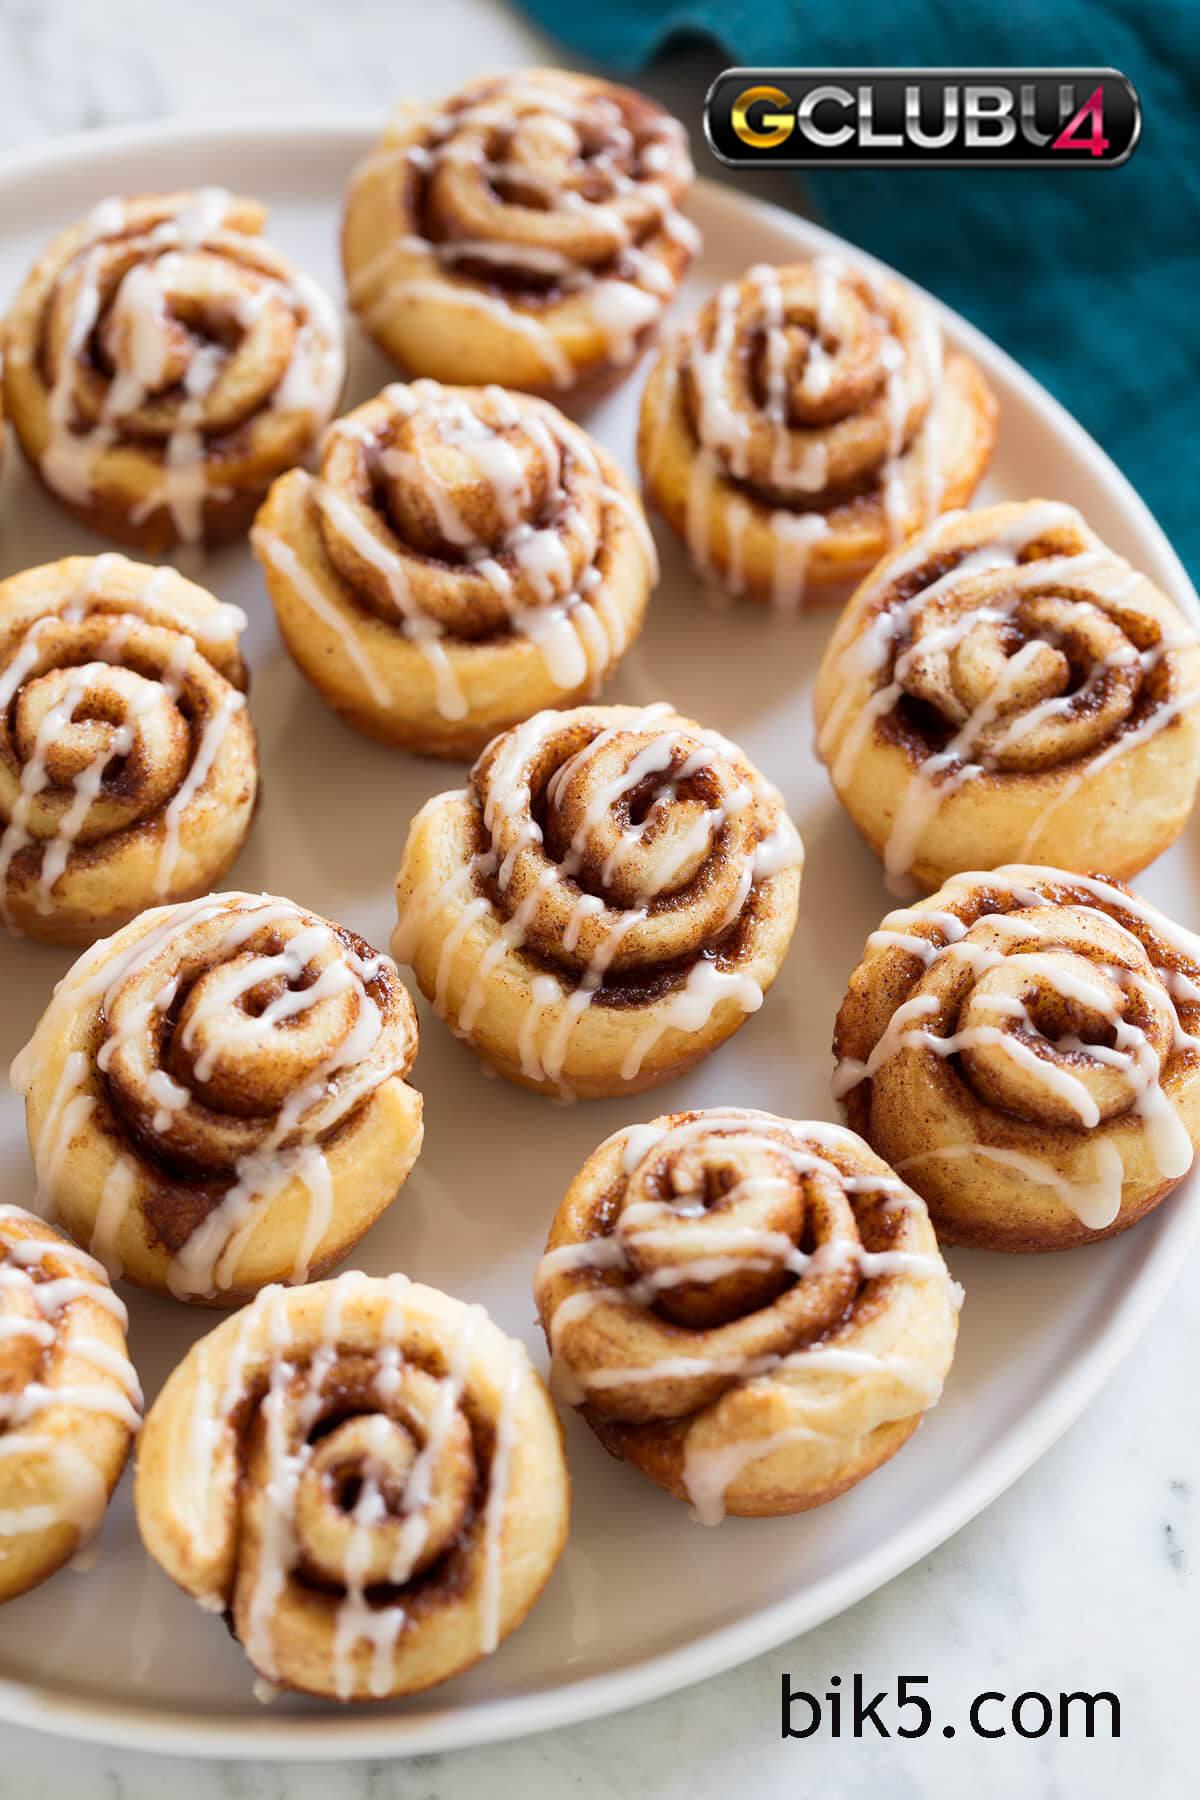 cinnamon rolls ของหวานที่น่าสนใจ